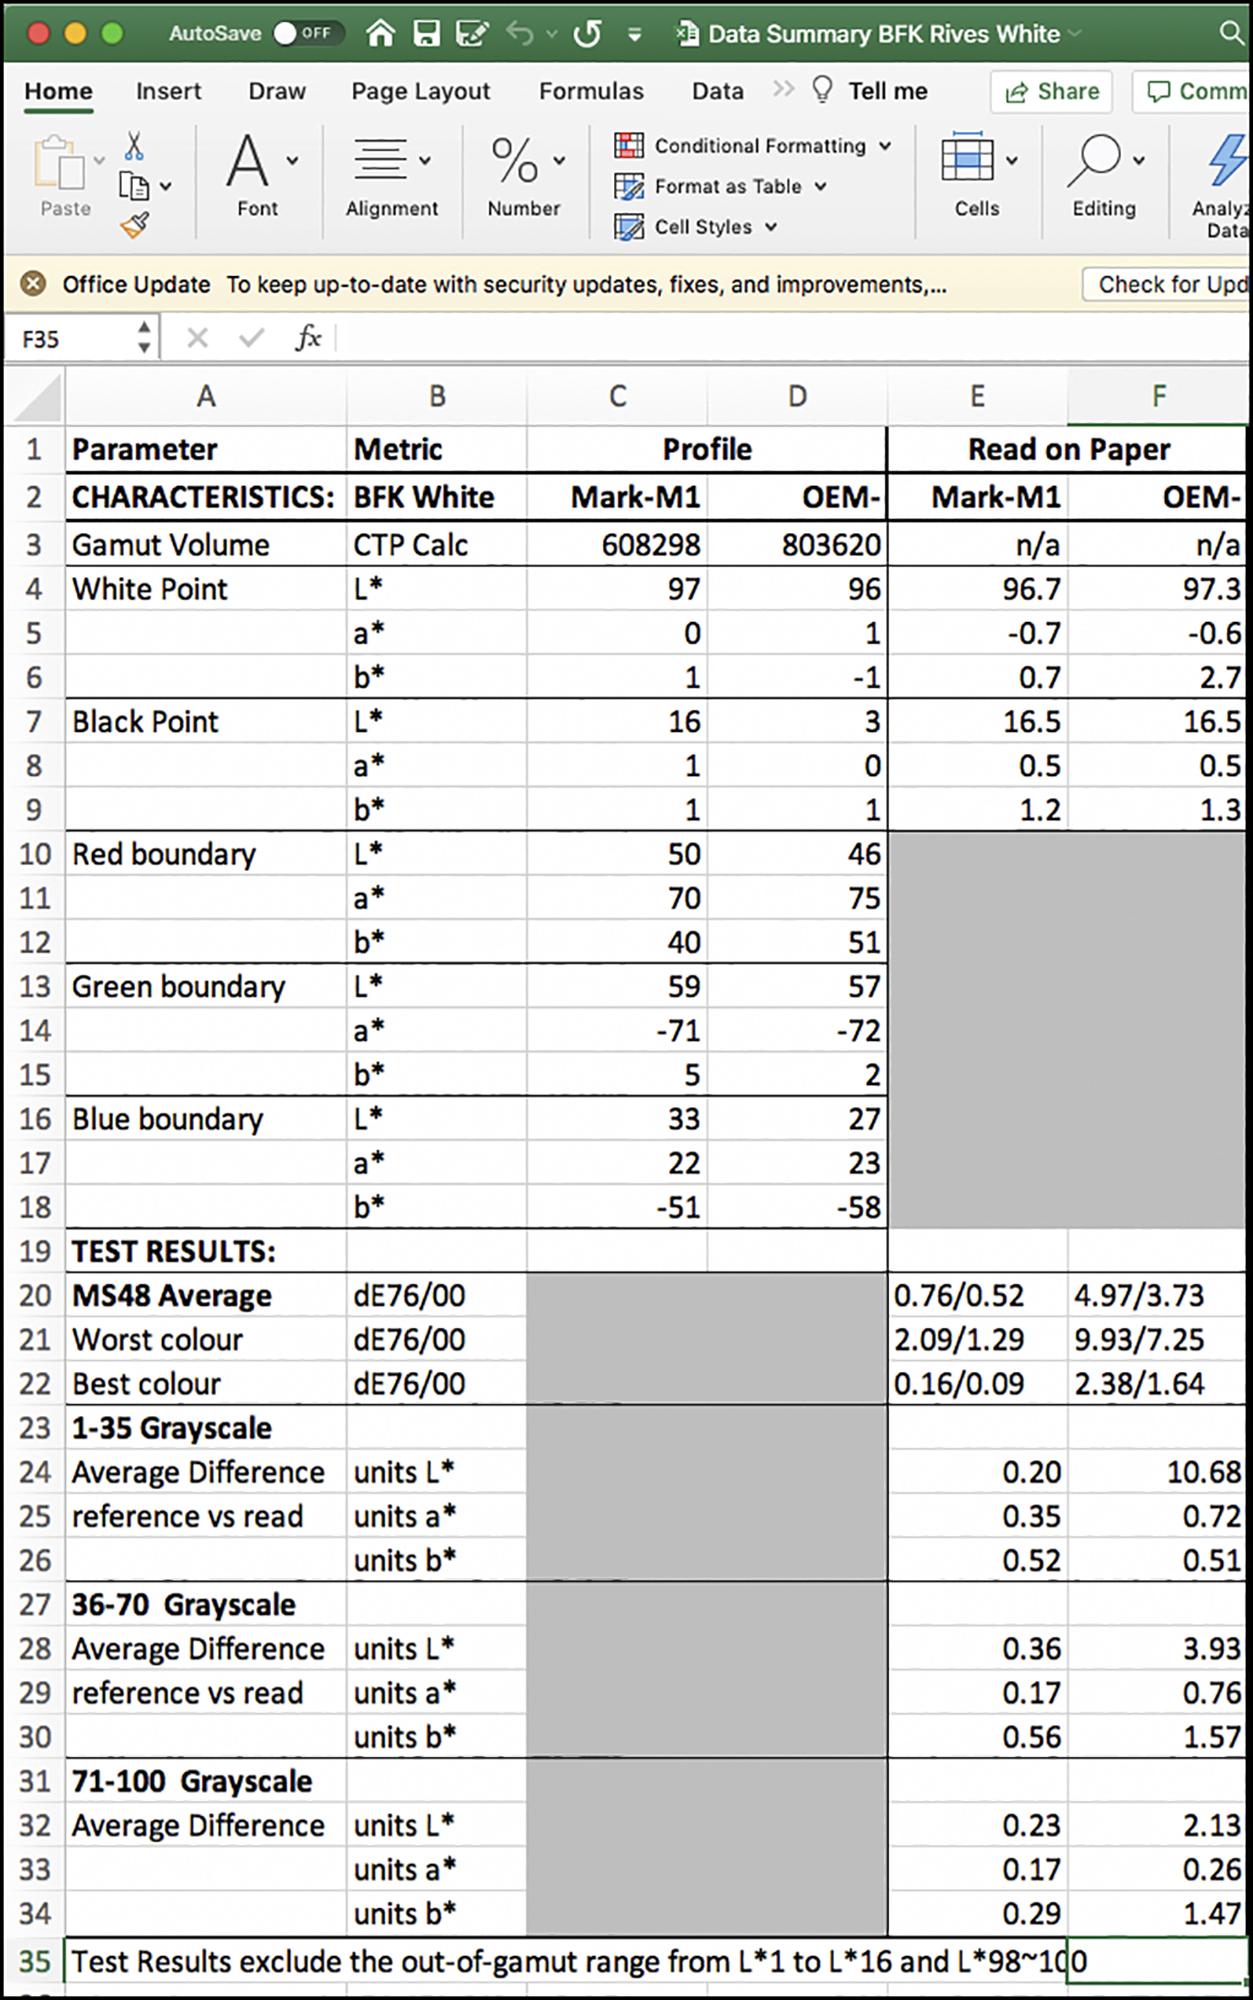 Figure 4. Data Summary BFKW